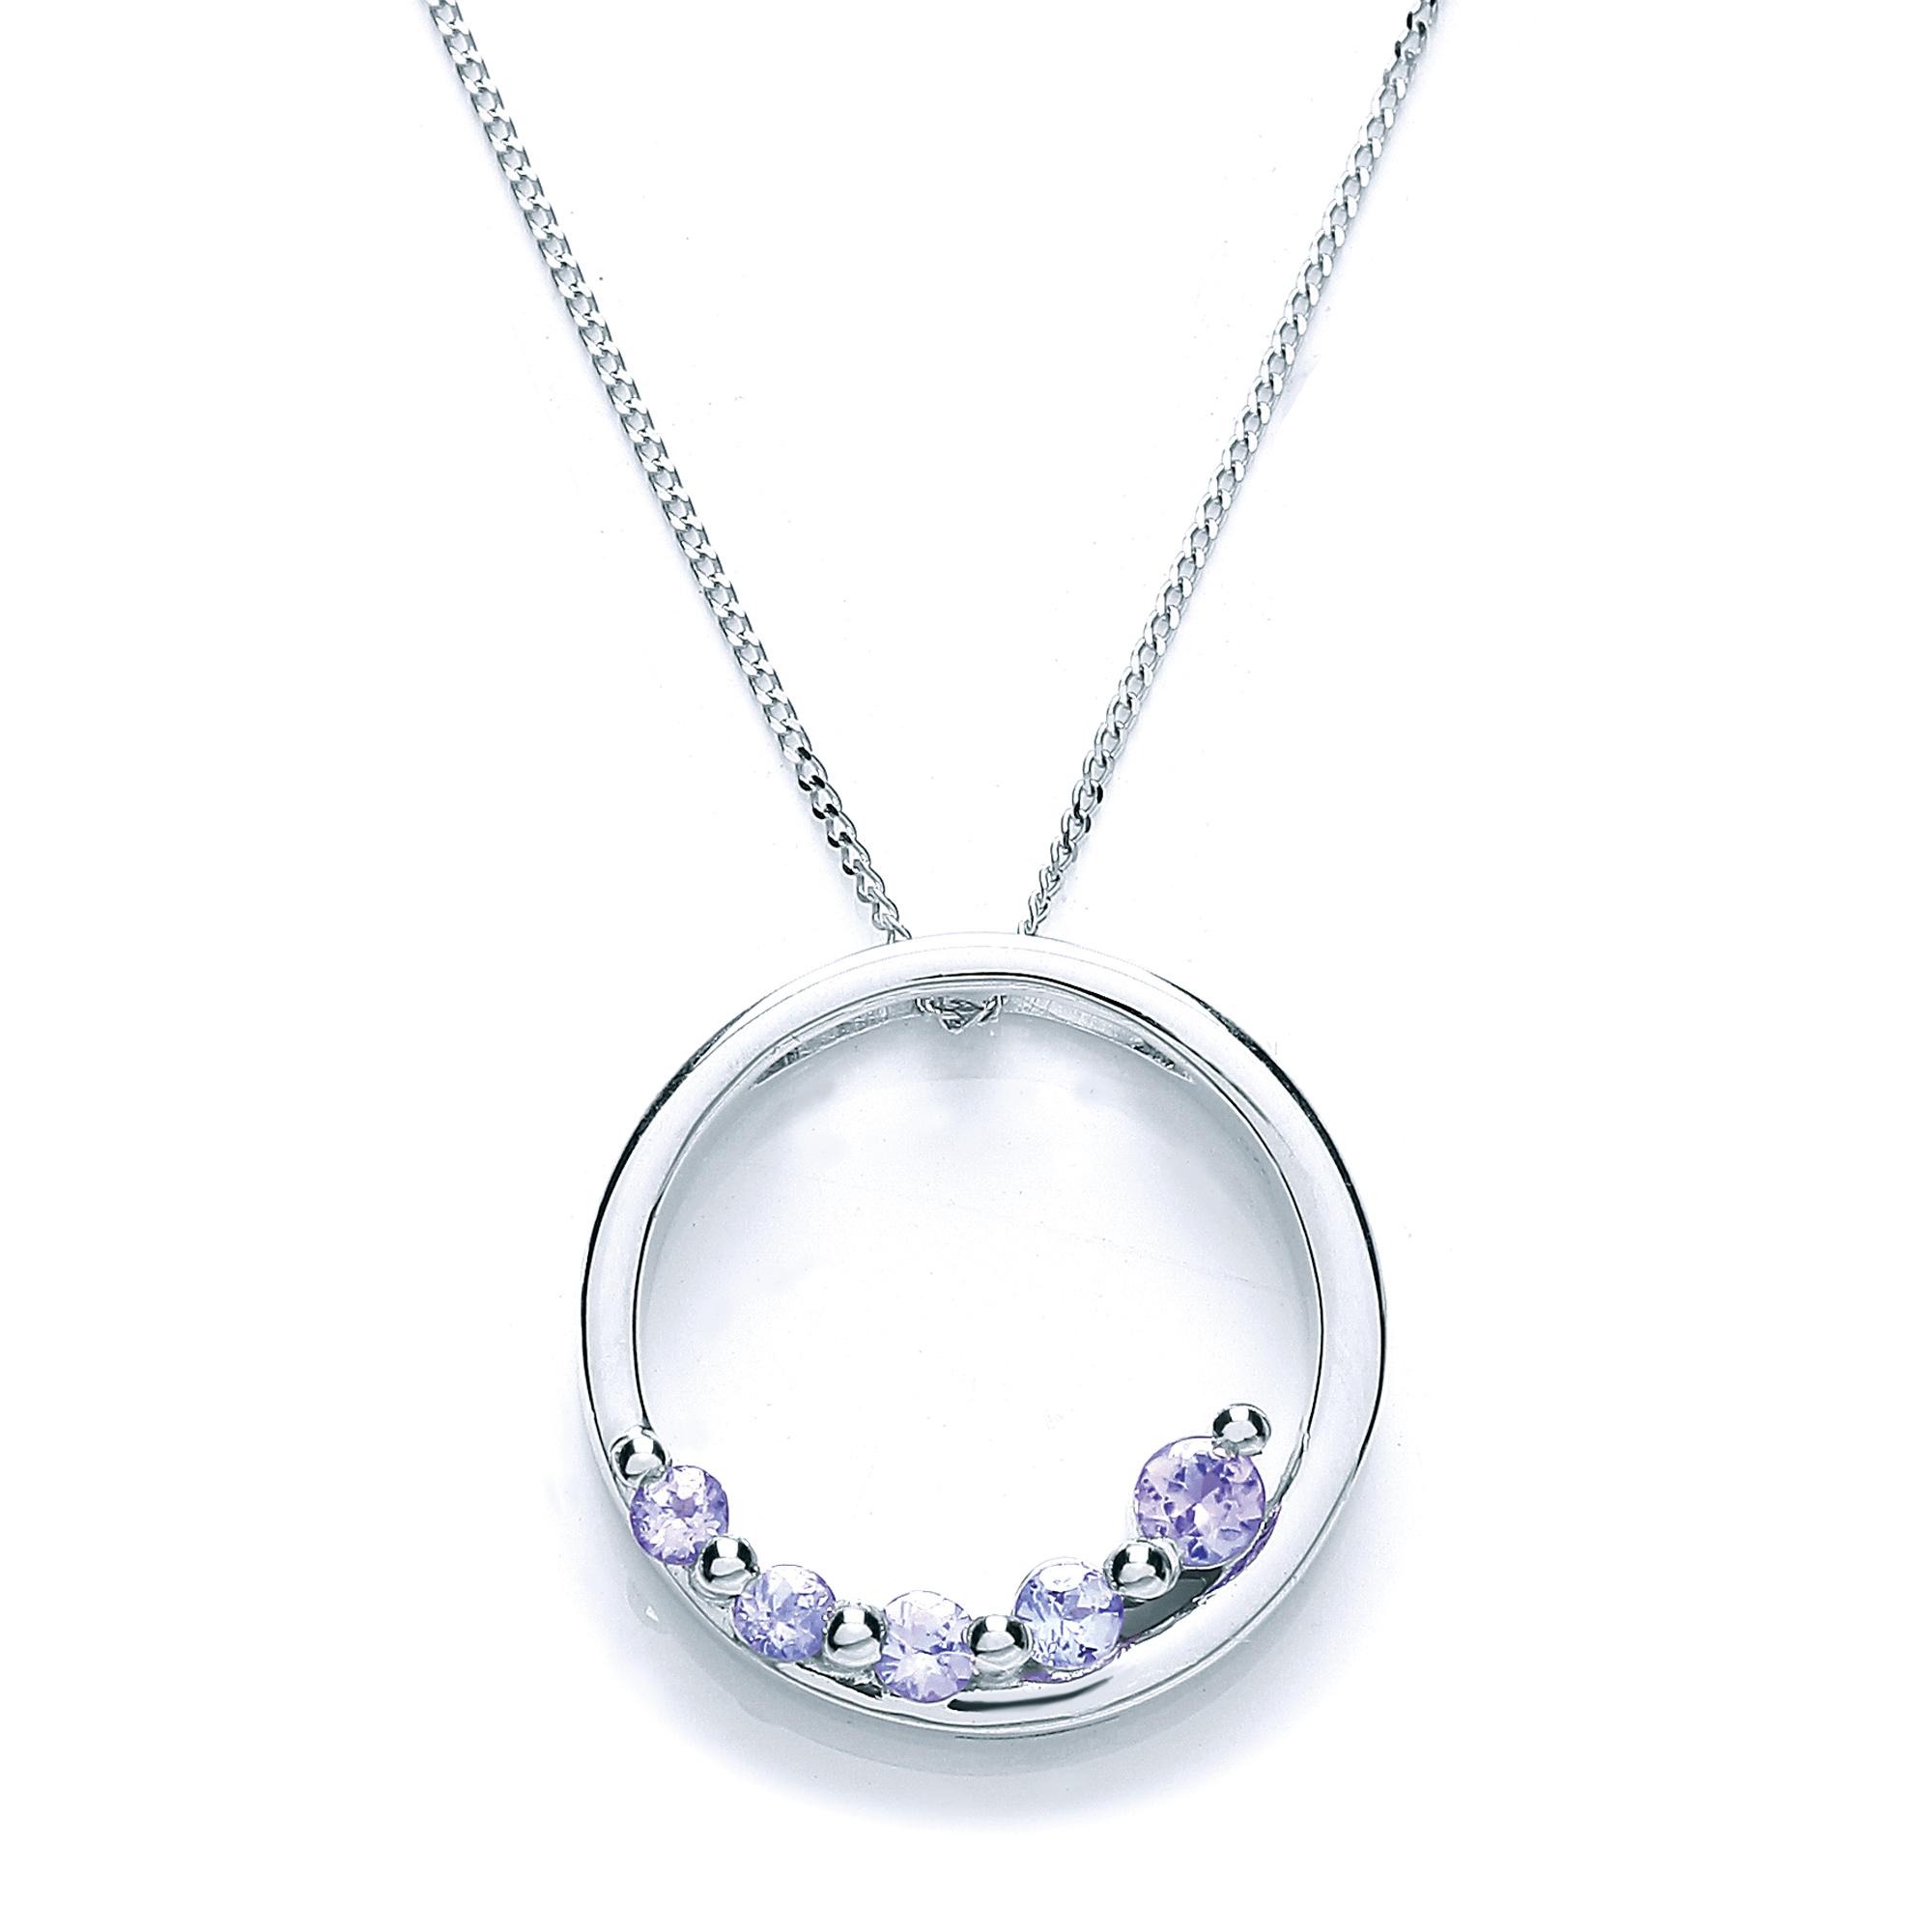 9 carat white gold tanzanite pendant hj johnson devizes 9 carat white gold tanzanite pendant aloadofball Image collections